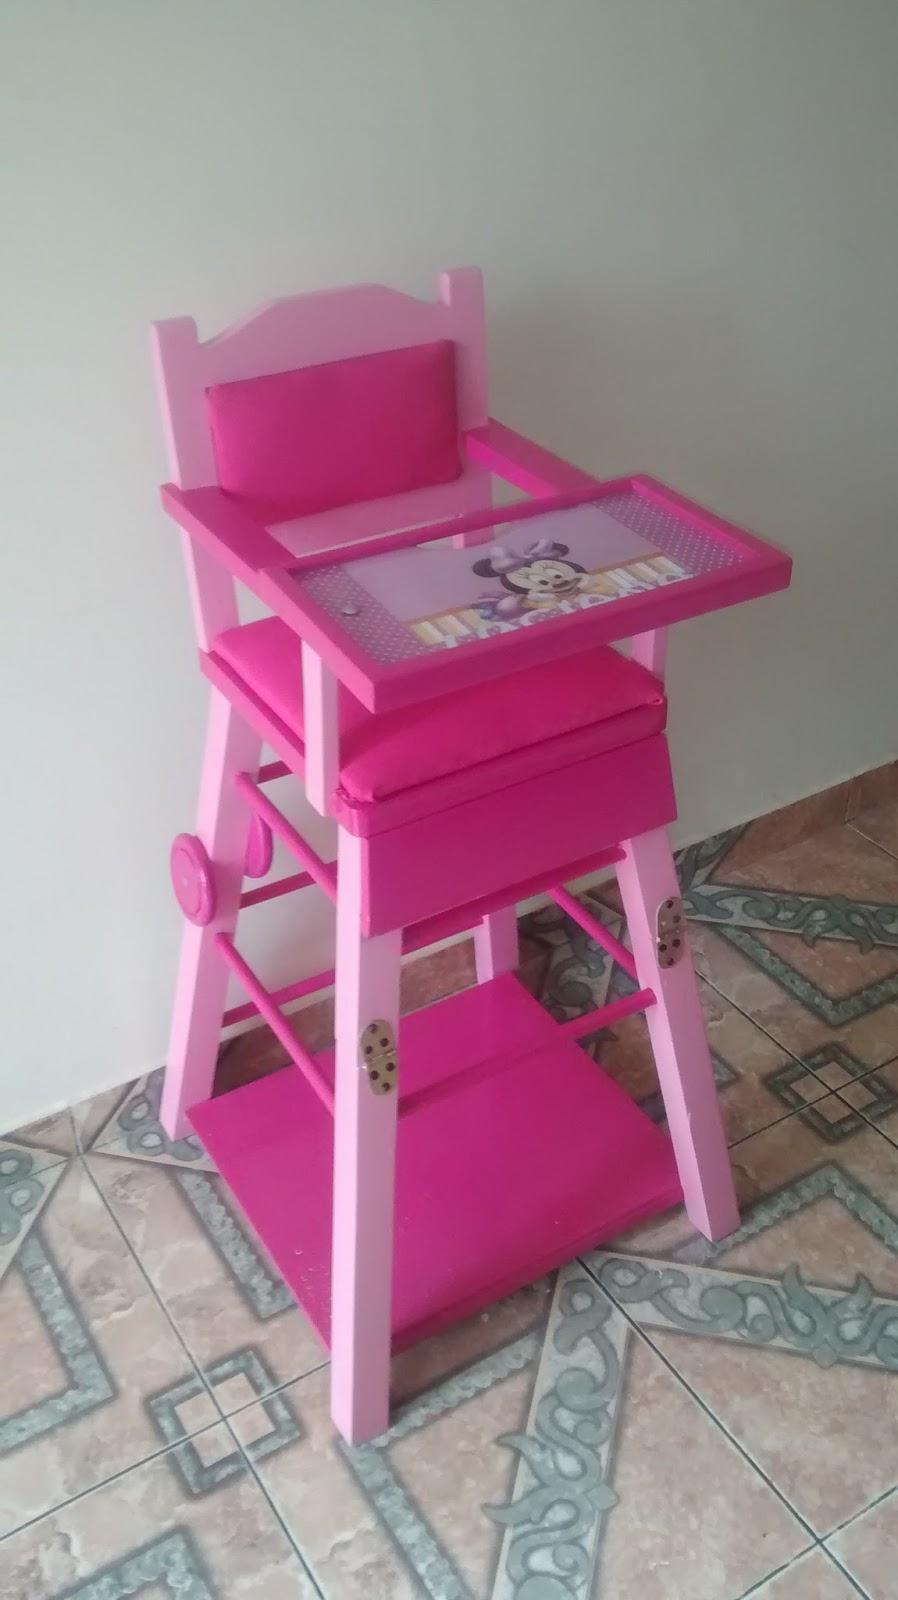 Galeria arte y dise o madekids silla comedor para bebe for Silla de bebe de madera